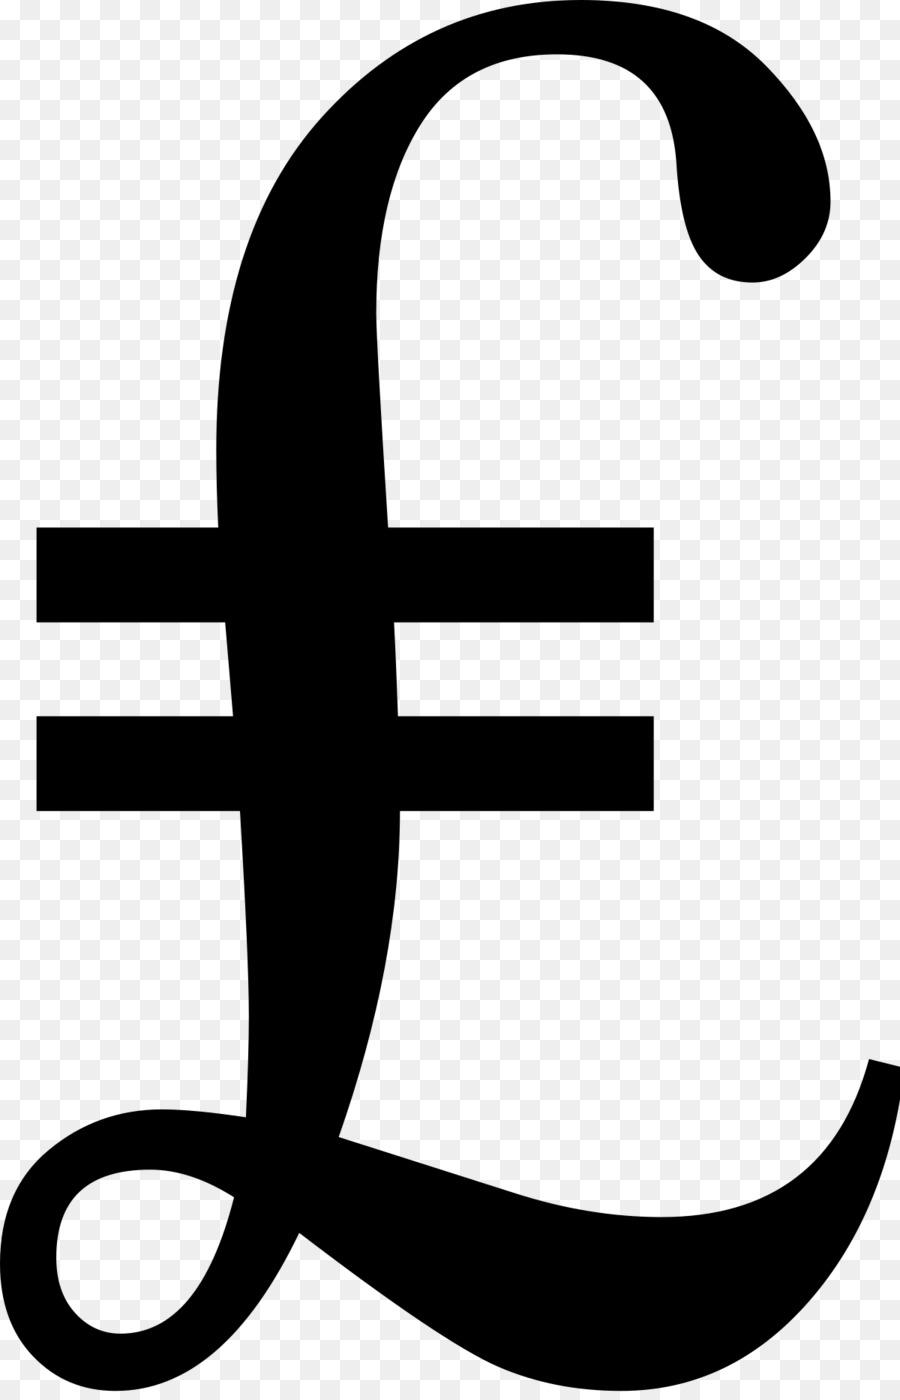 Turkish Lira Sign Pound Sign Currency Symbol Symbol Png